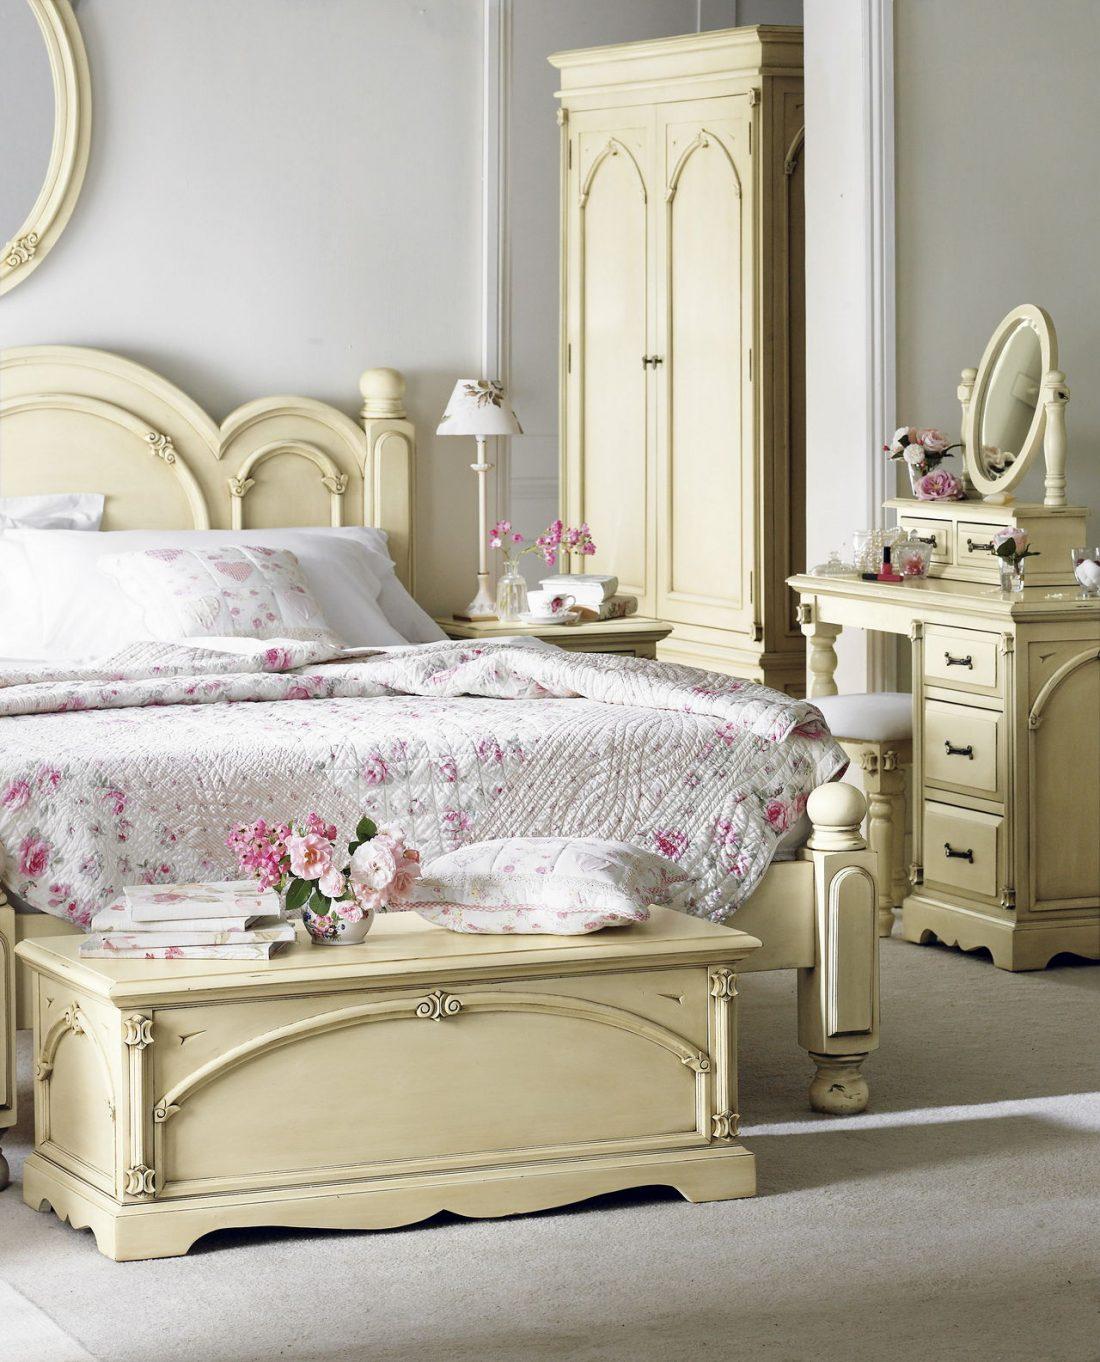 Спальня в стиле прованс 6